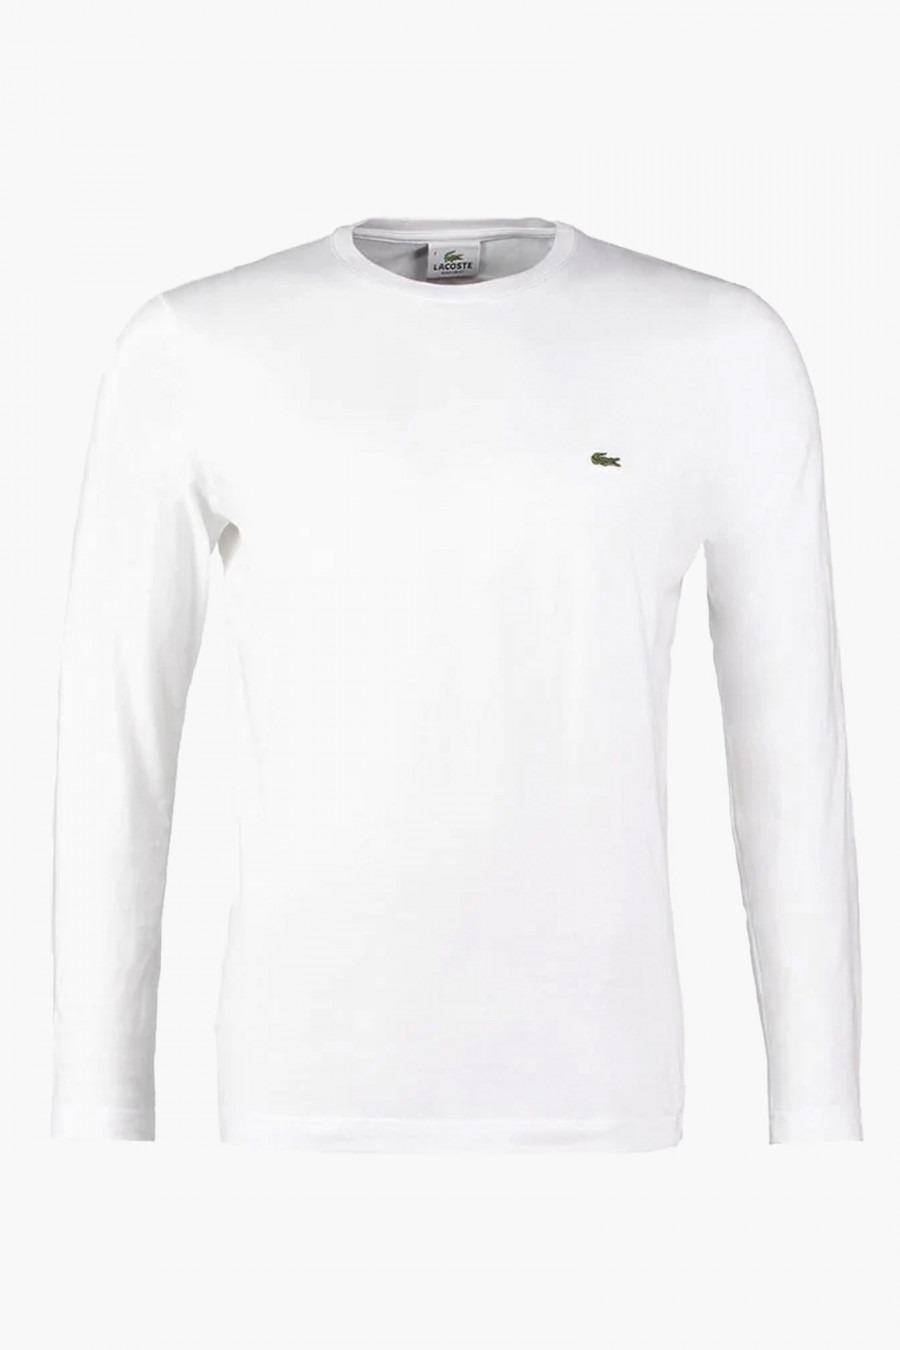 Lacoste T-Shirt Ras Bianca Uomo 1